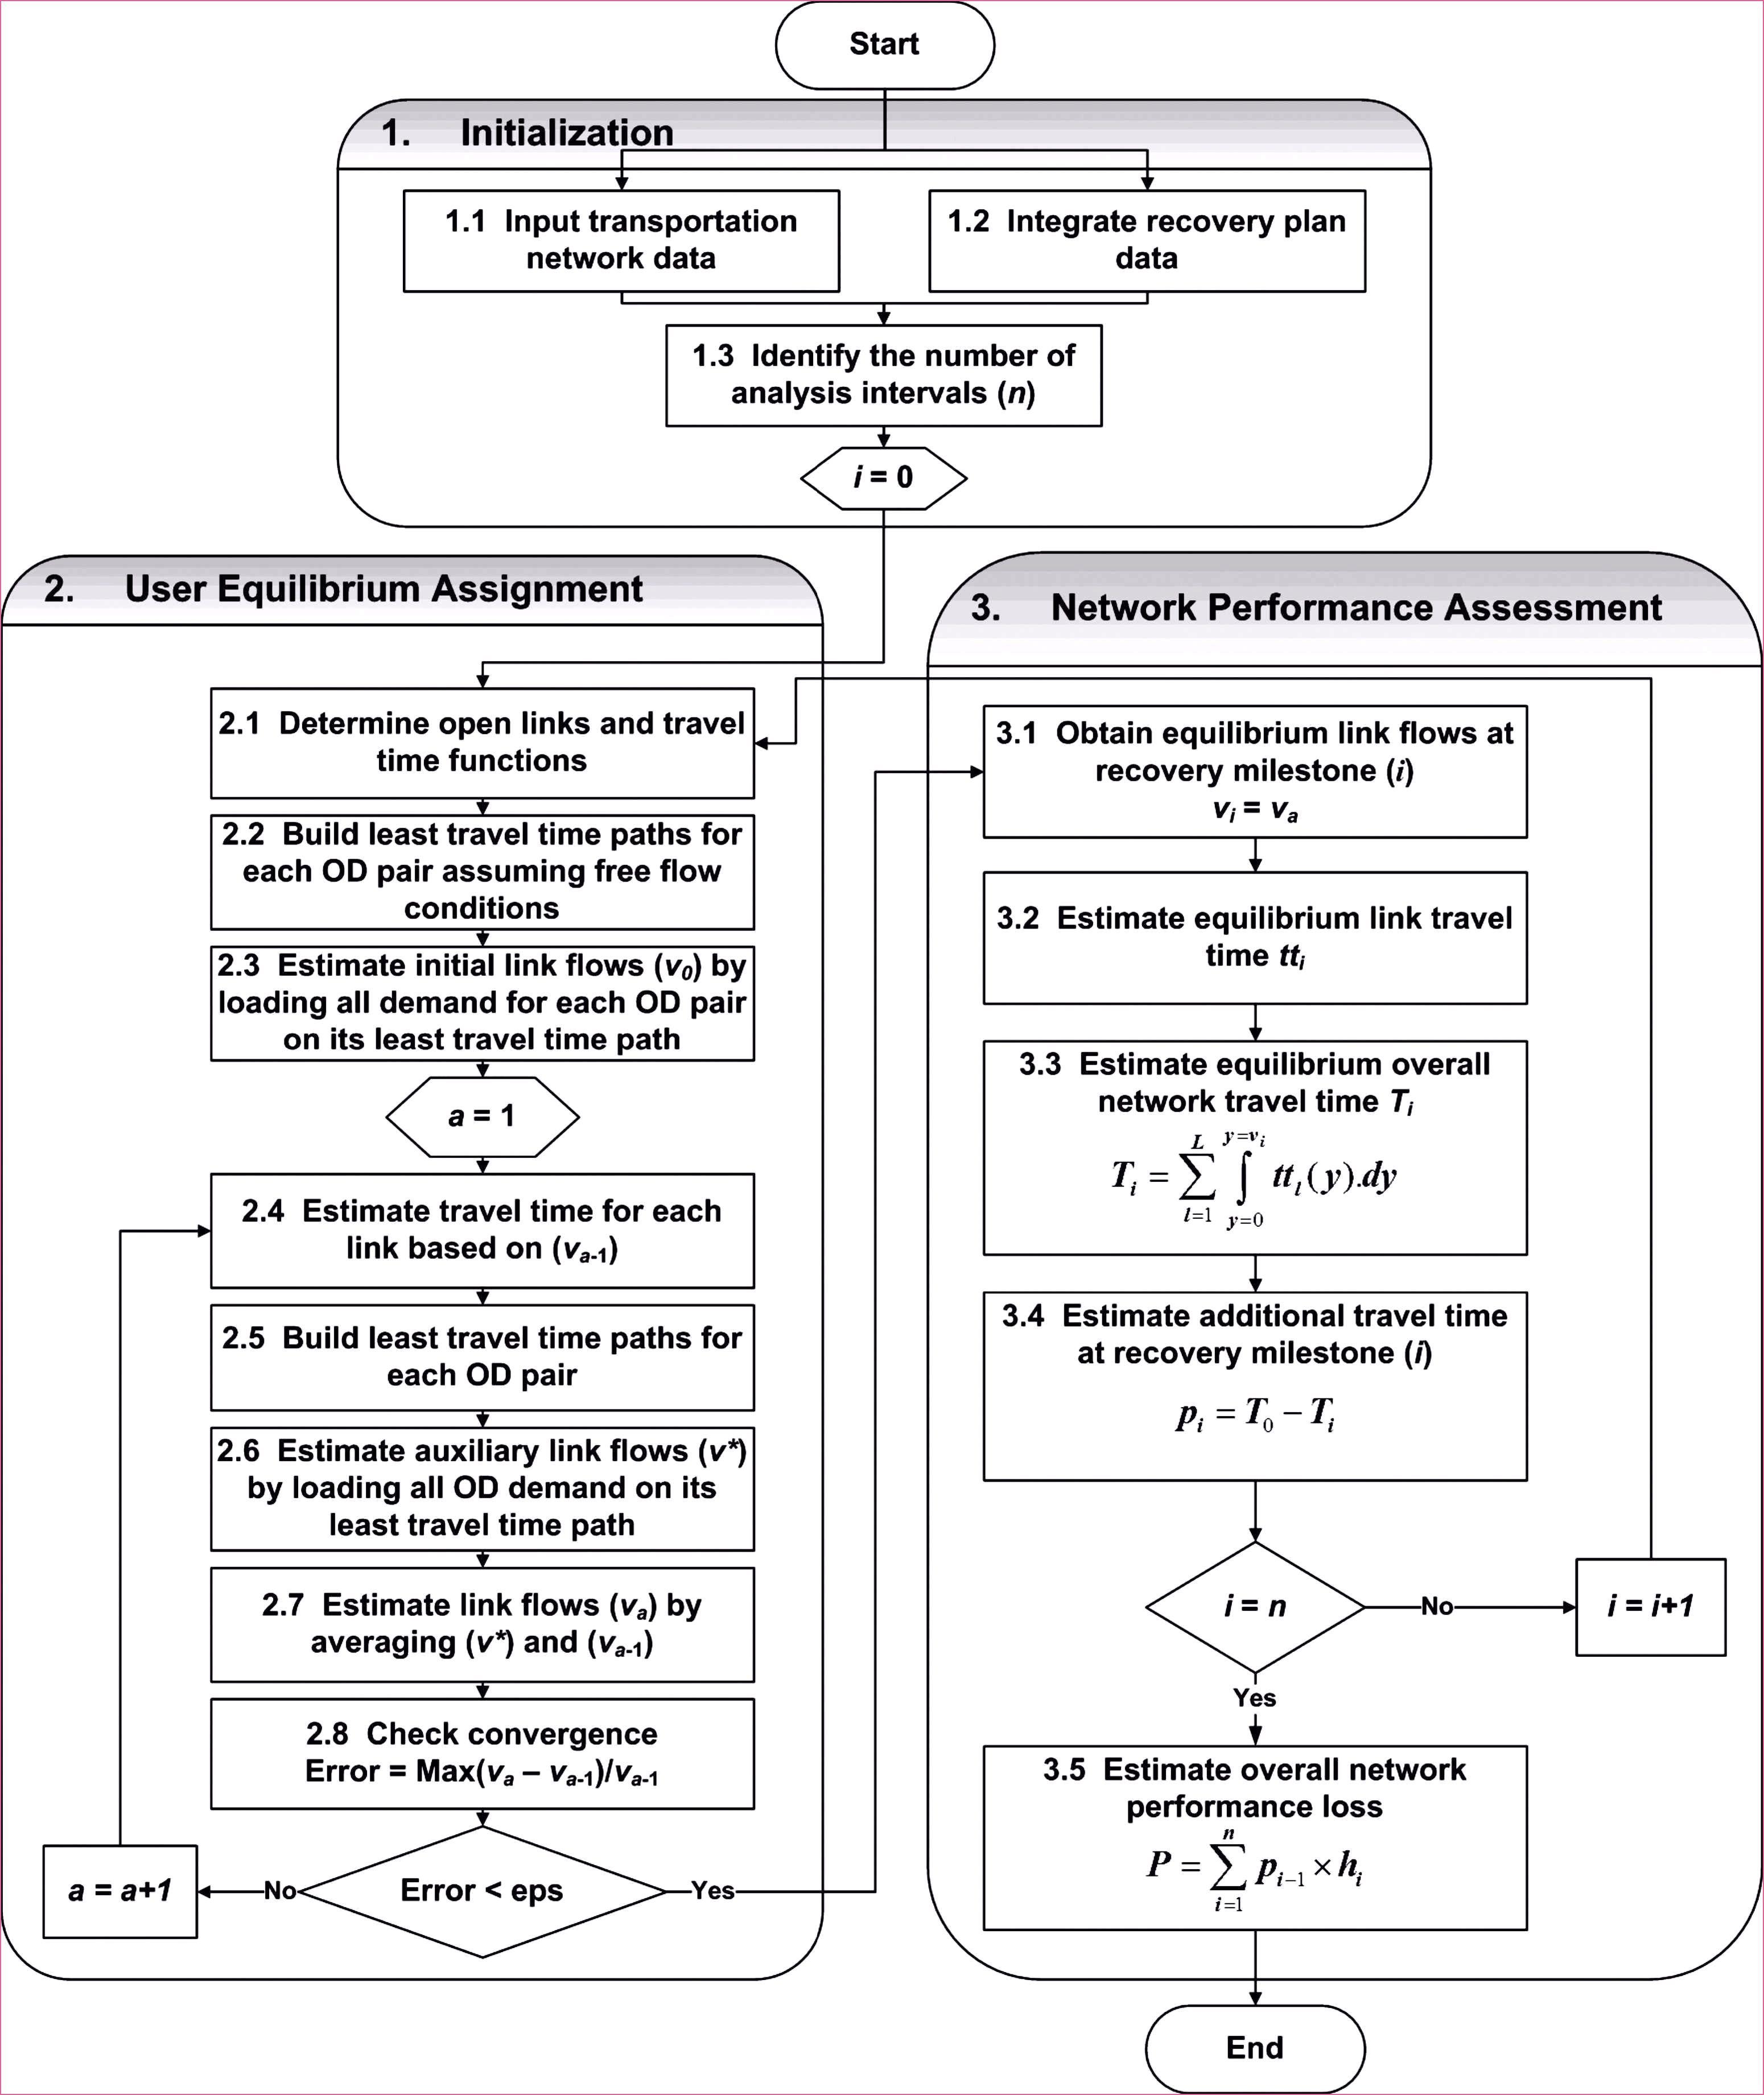 Fein Umstellungsantrag Reha Klinik Muster In 2020 Vorlagen Vorlagen Word Lebenslauf Vorlagen Word